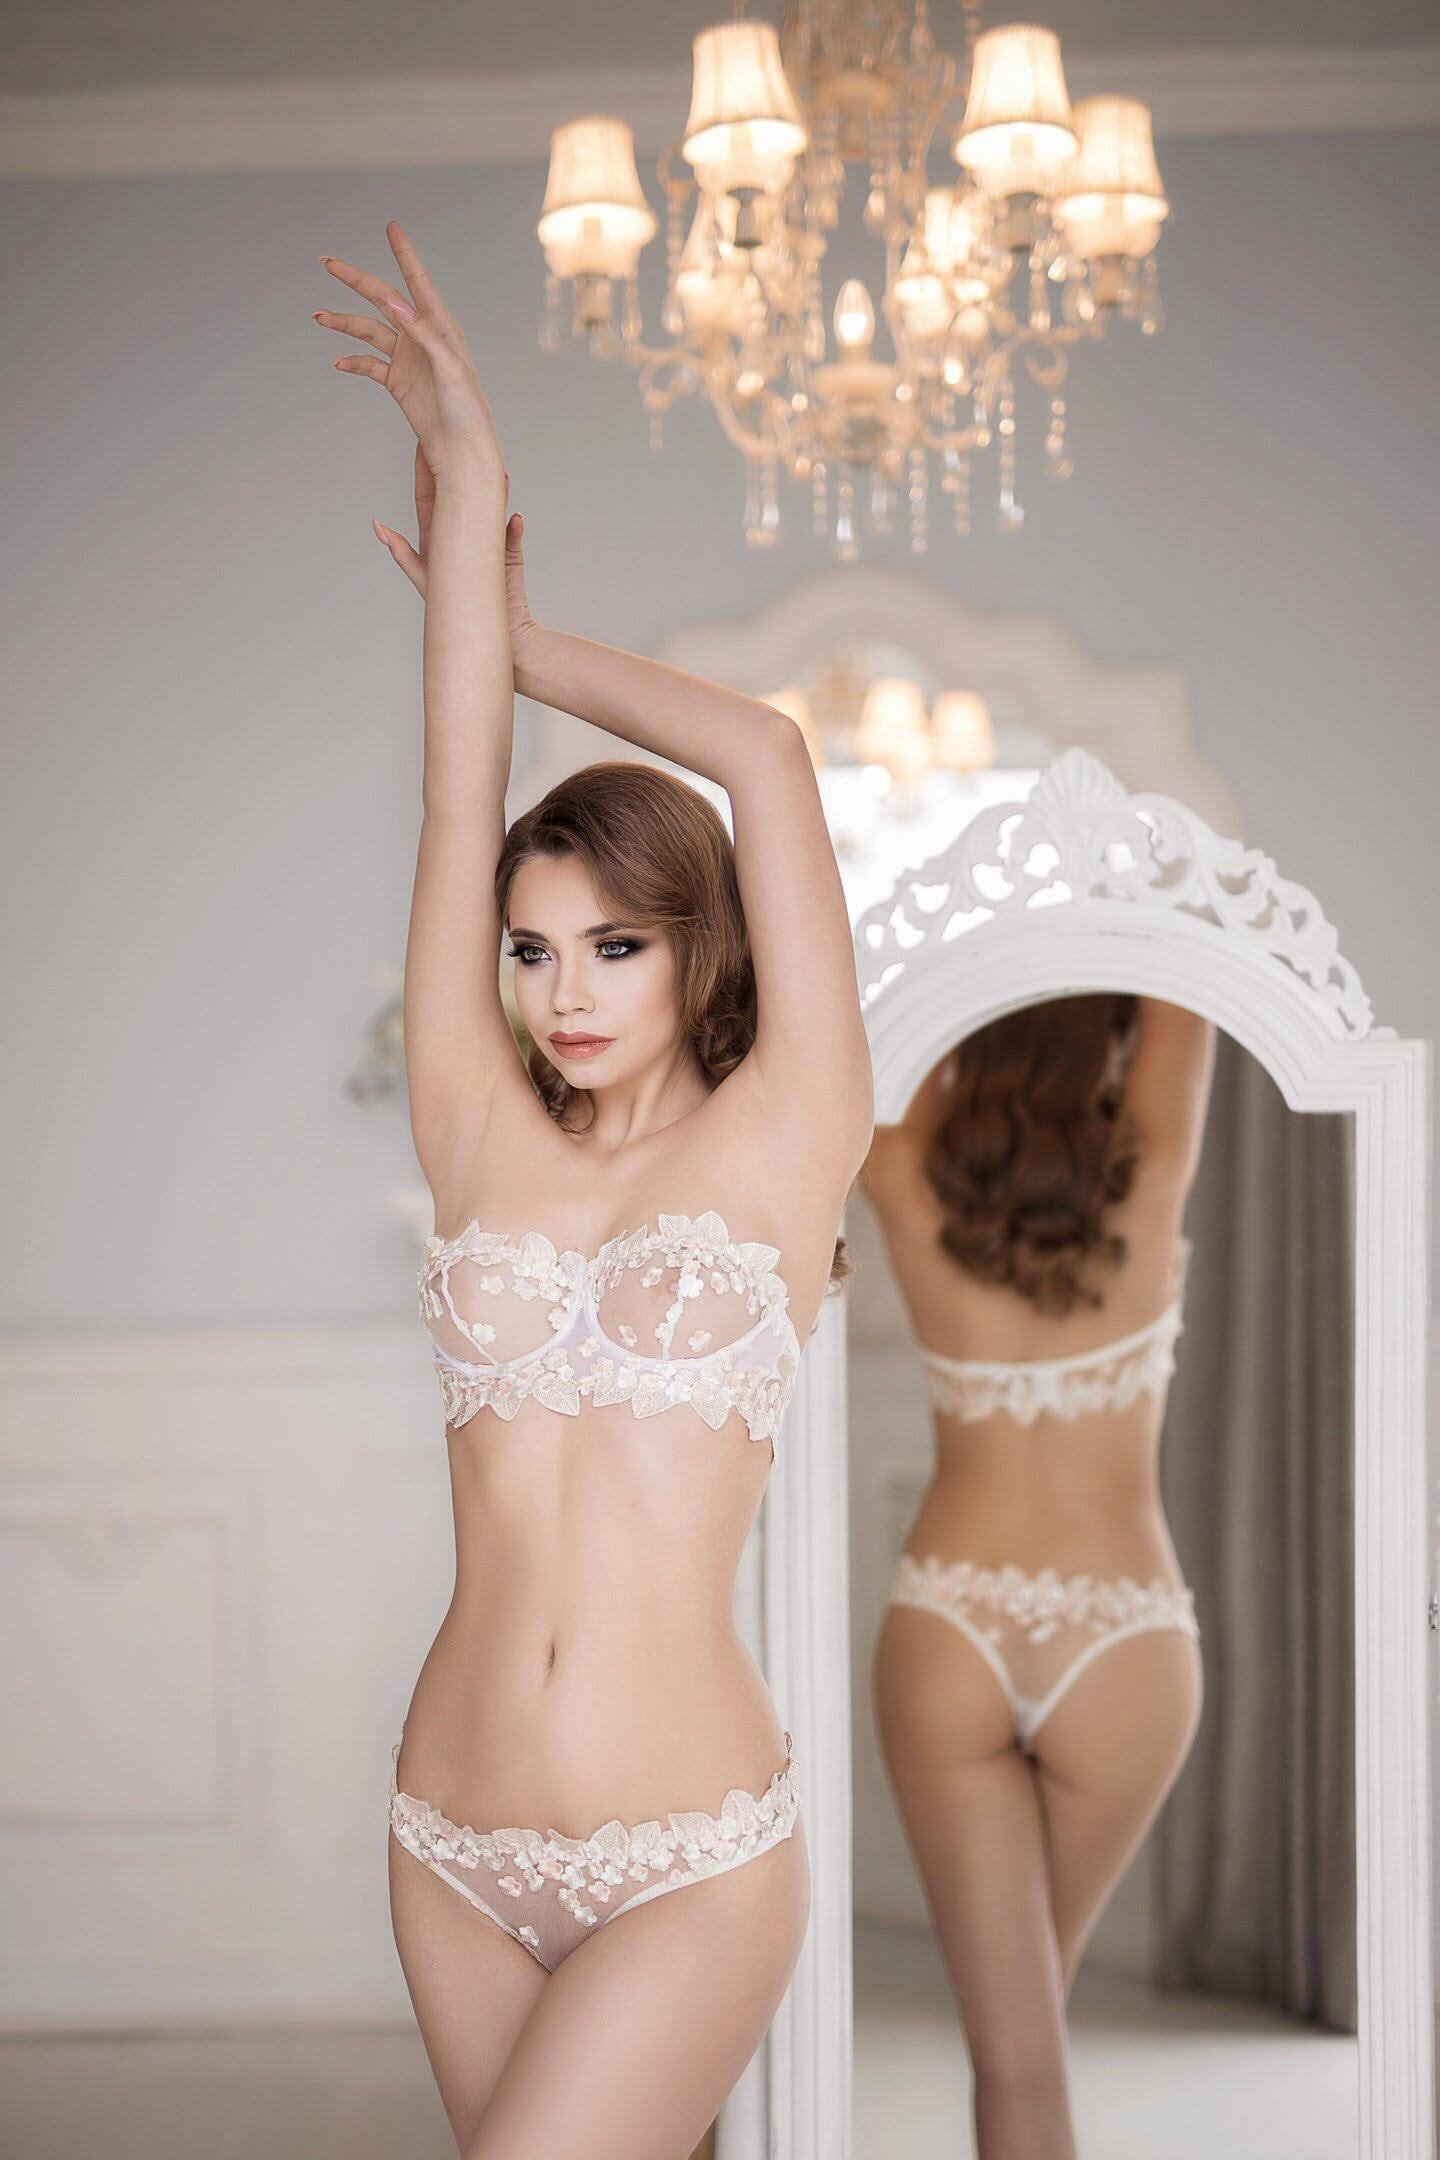 Cotton Panty Erotica